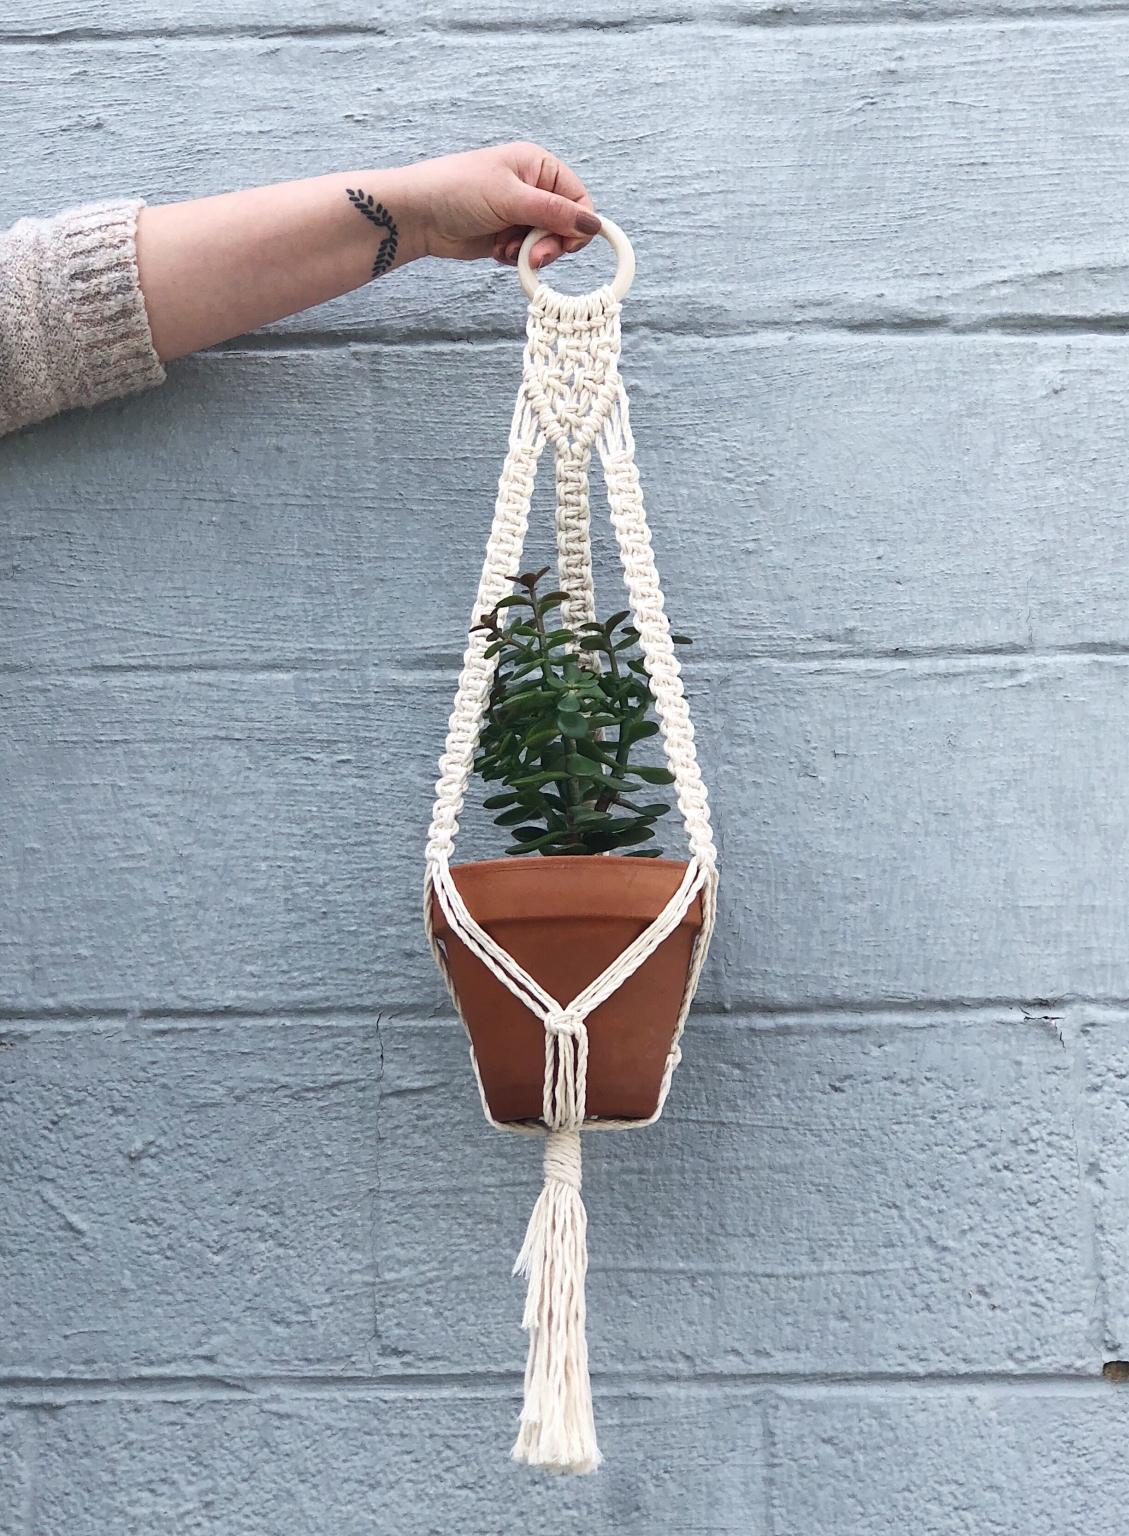 Design Your Own Plant Hanger